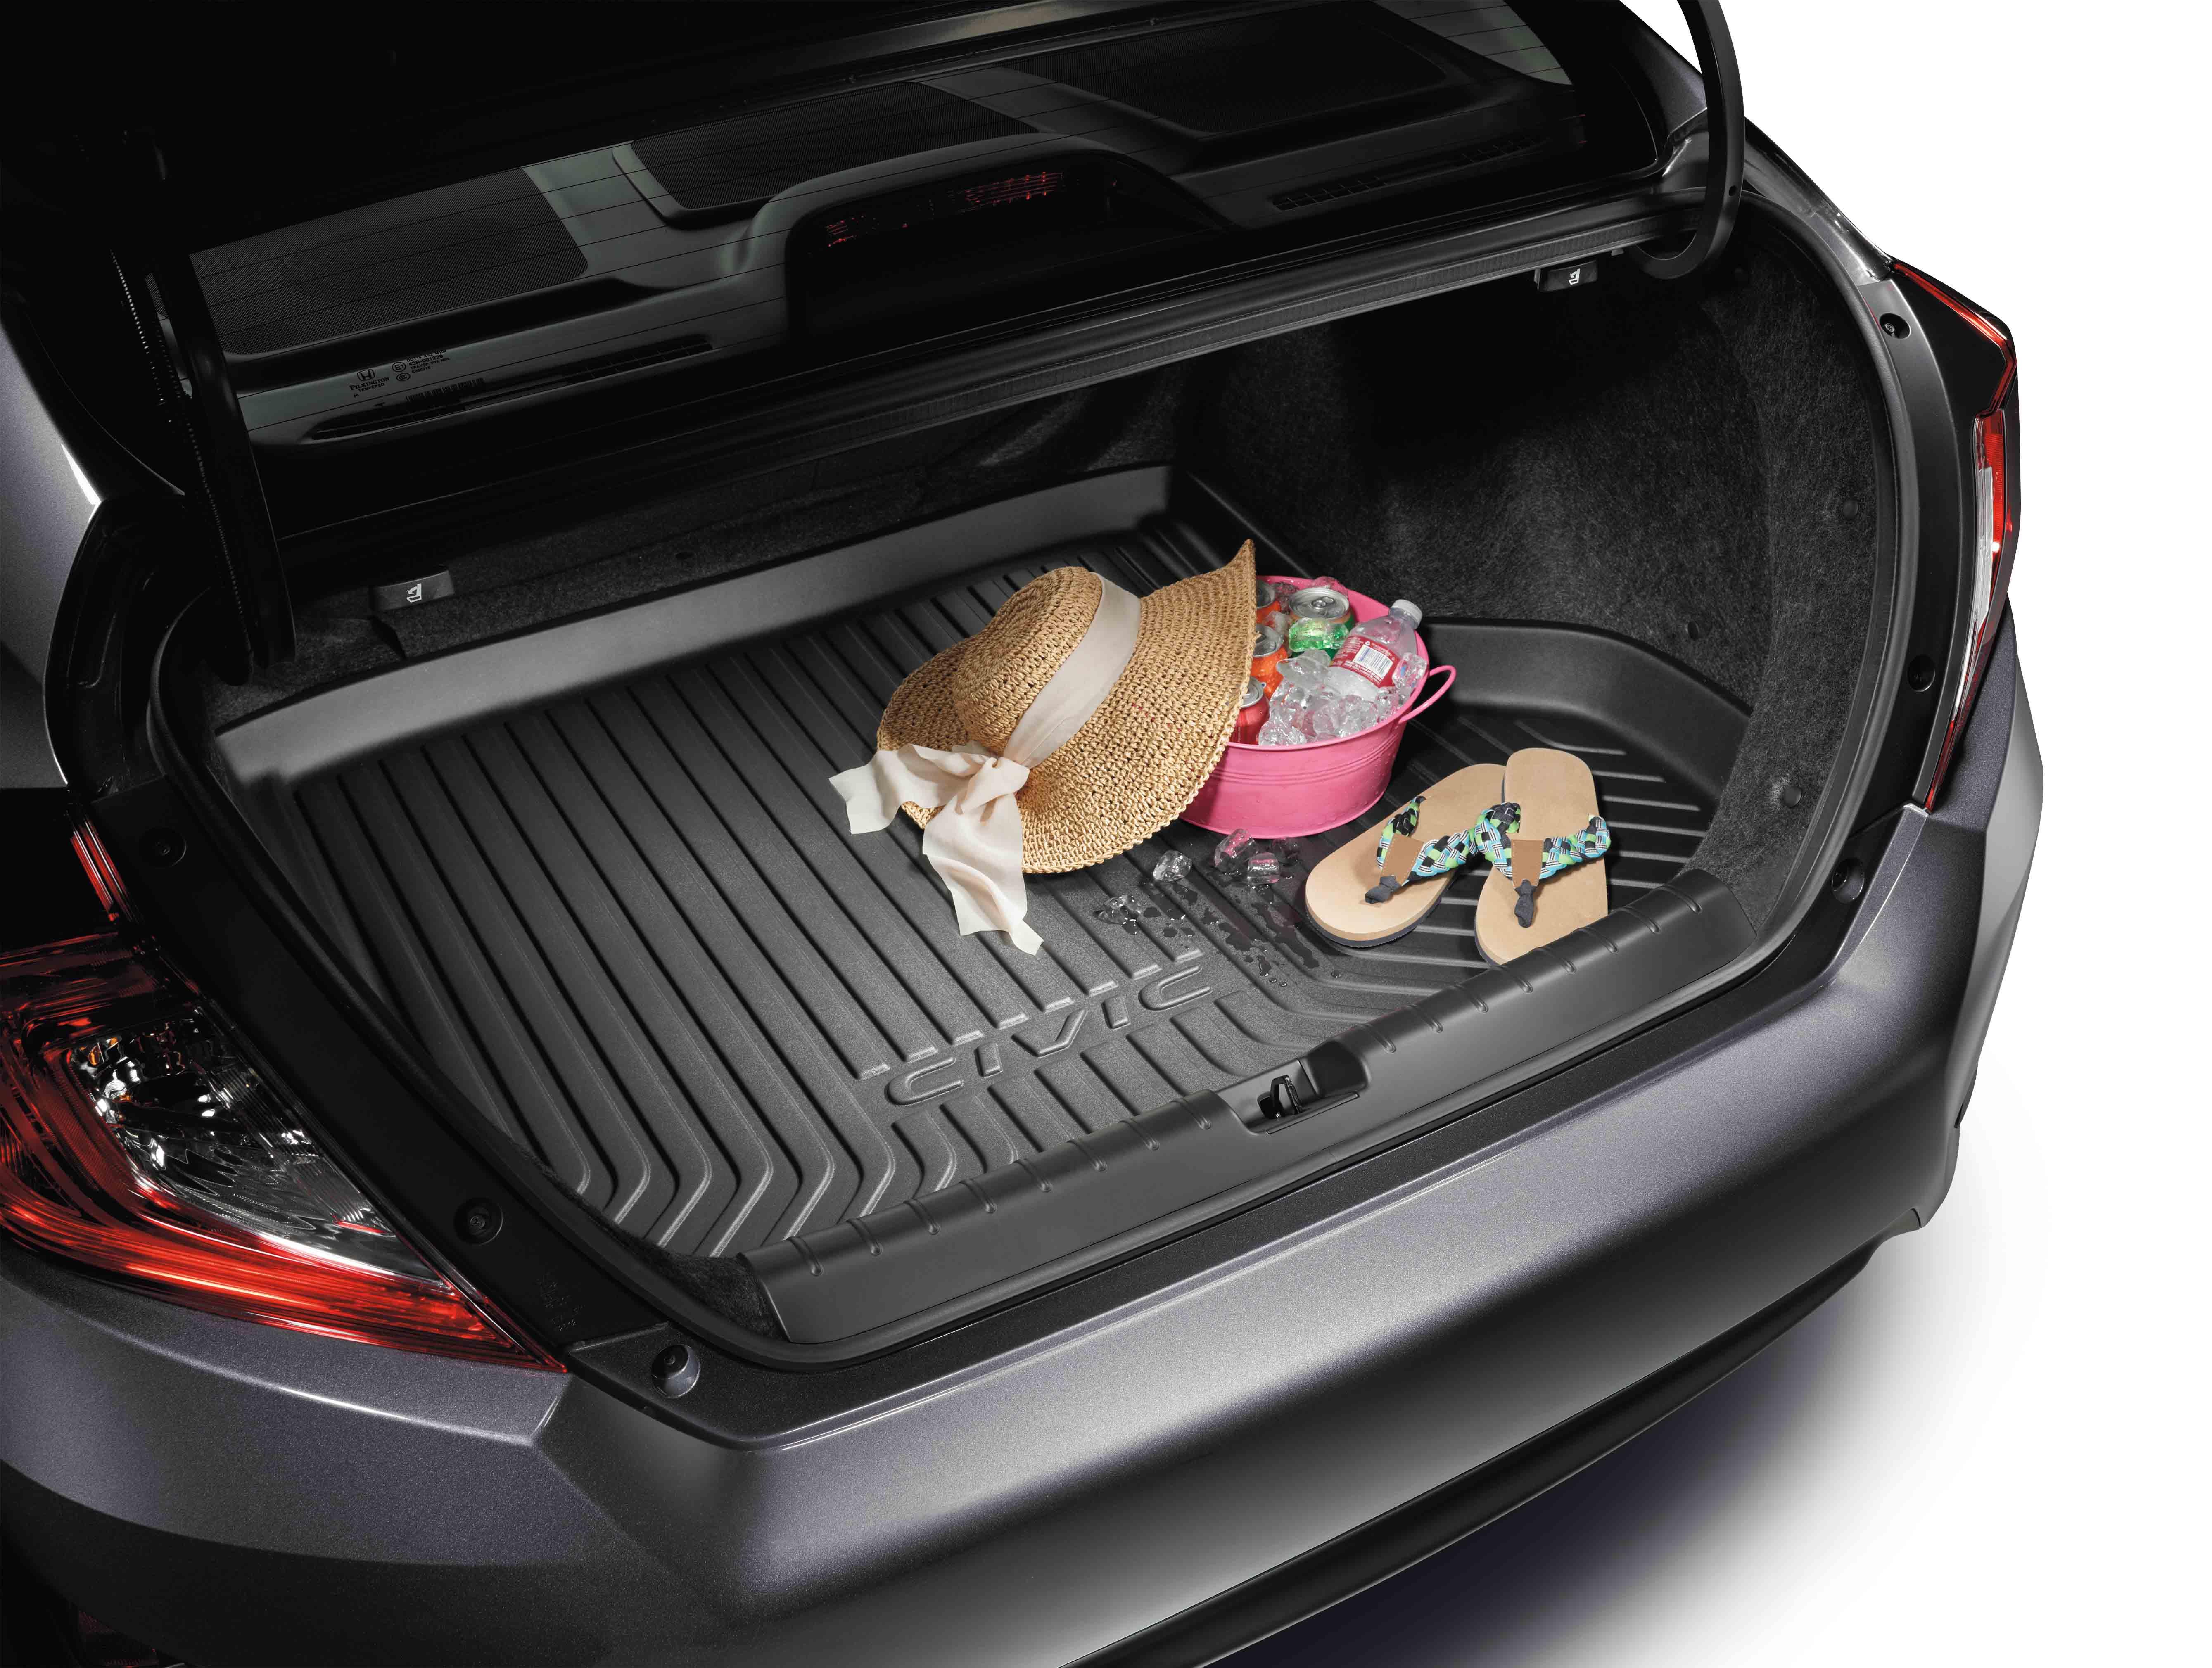 2016 2018 Honda Civic 4dr Trunk Tray 08U45 TBA 100